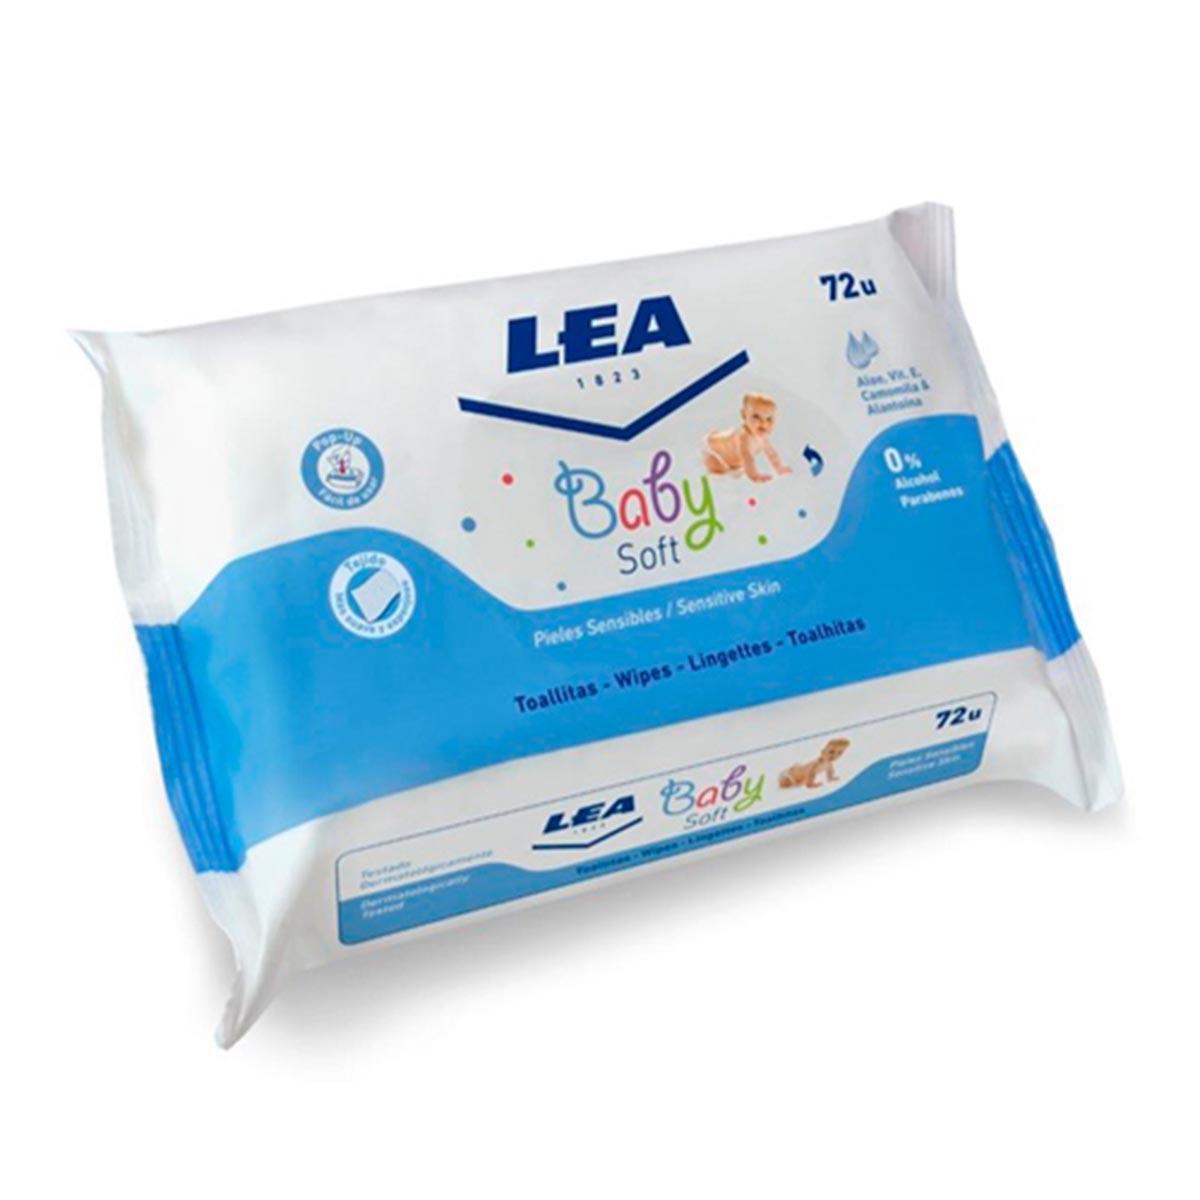 Lea Baby Soft Lingettes Peau Sensibles 72 Unites